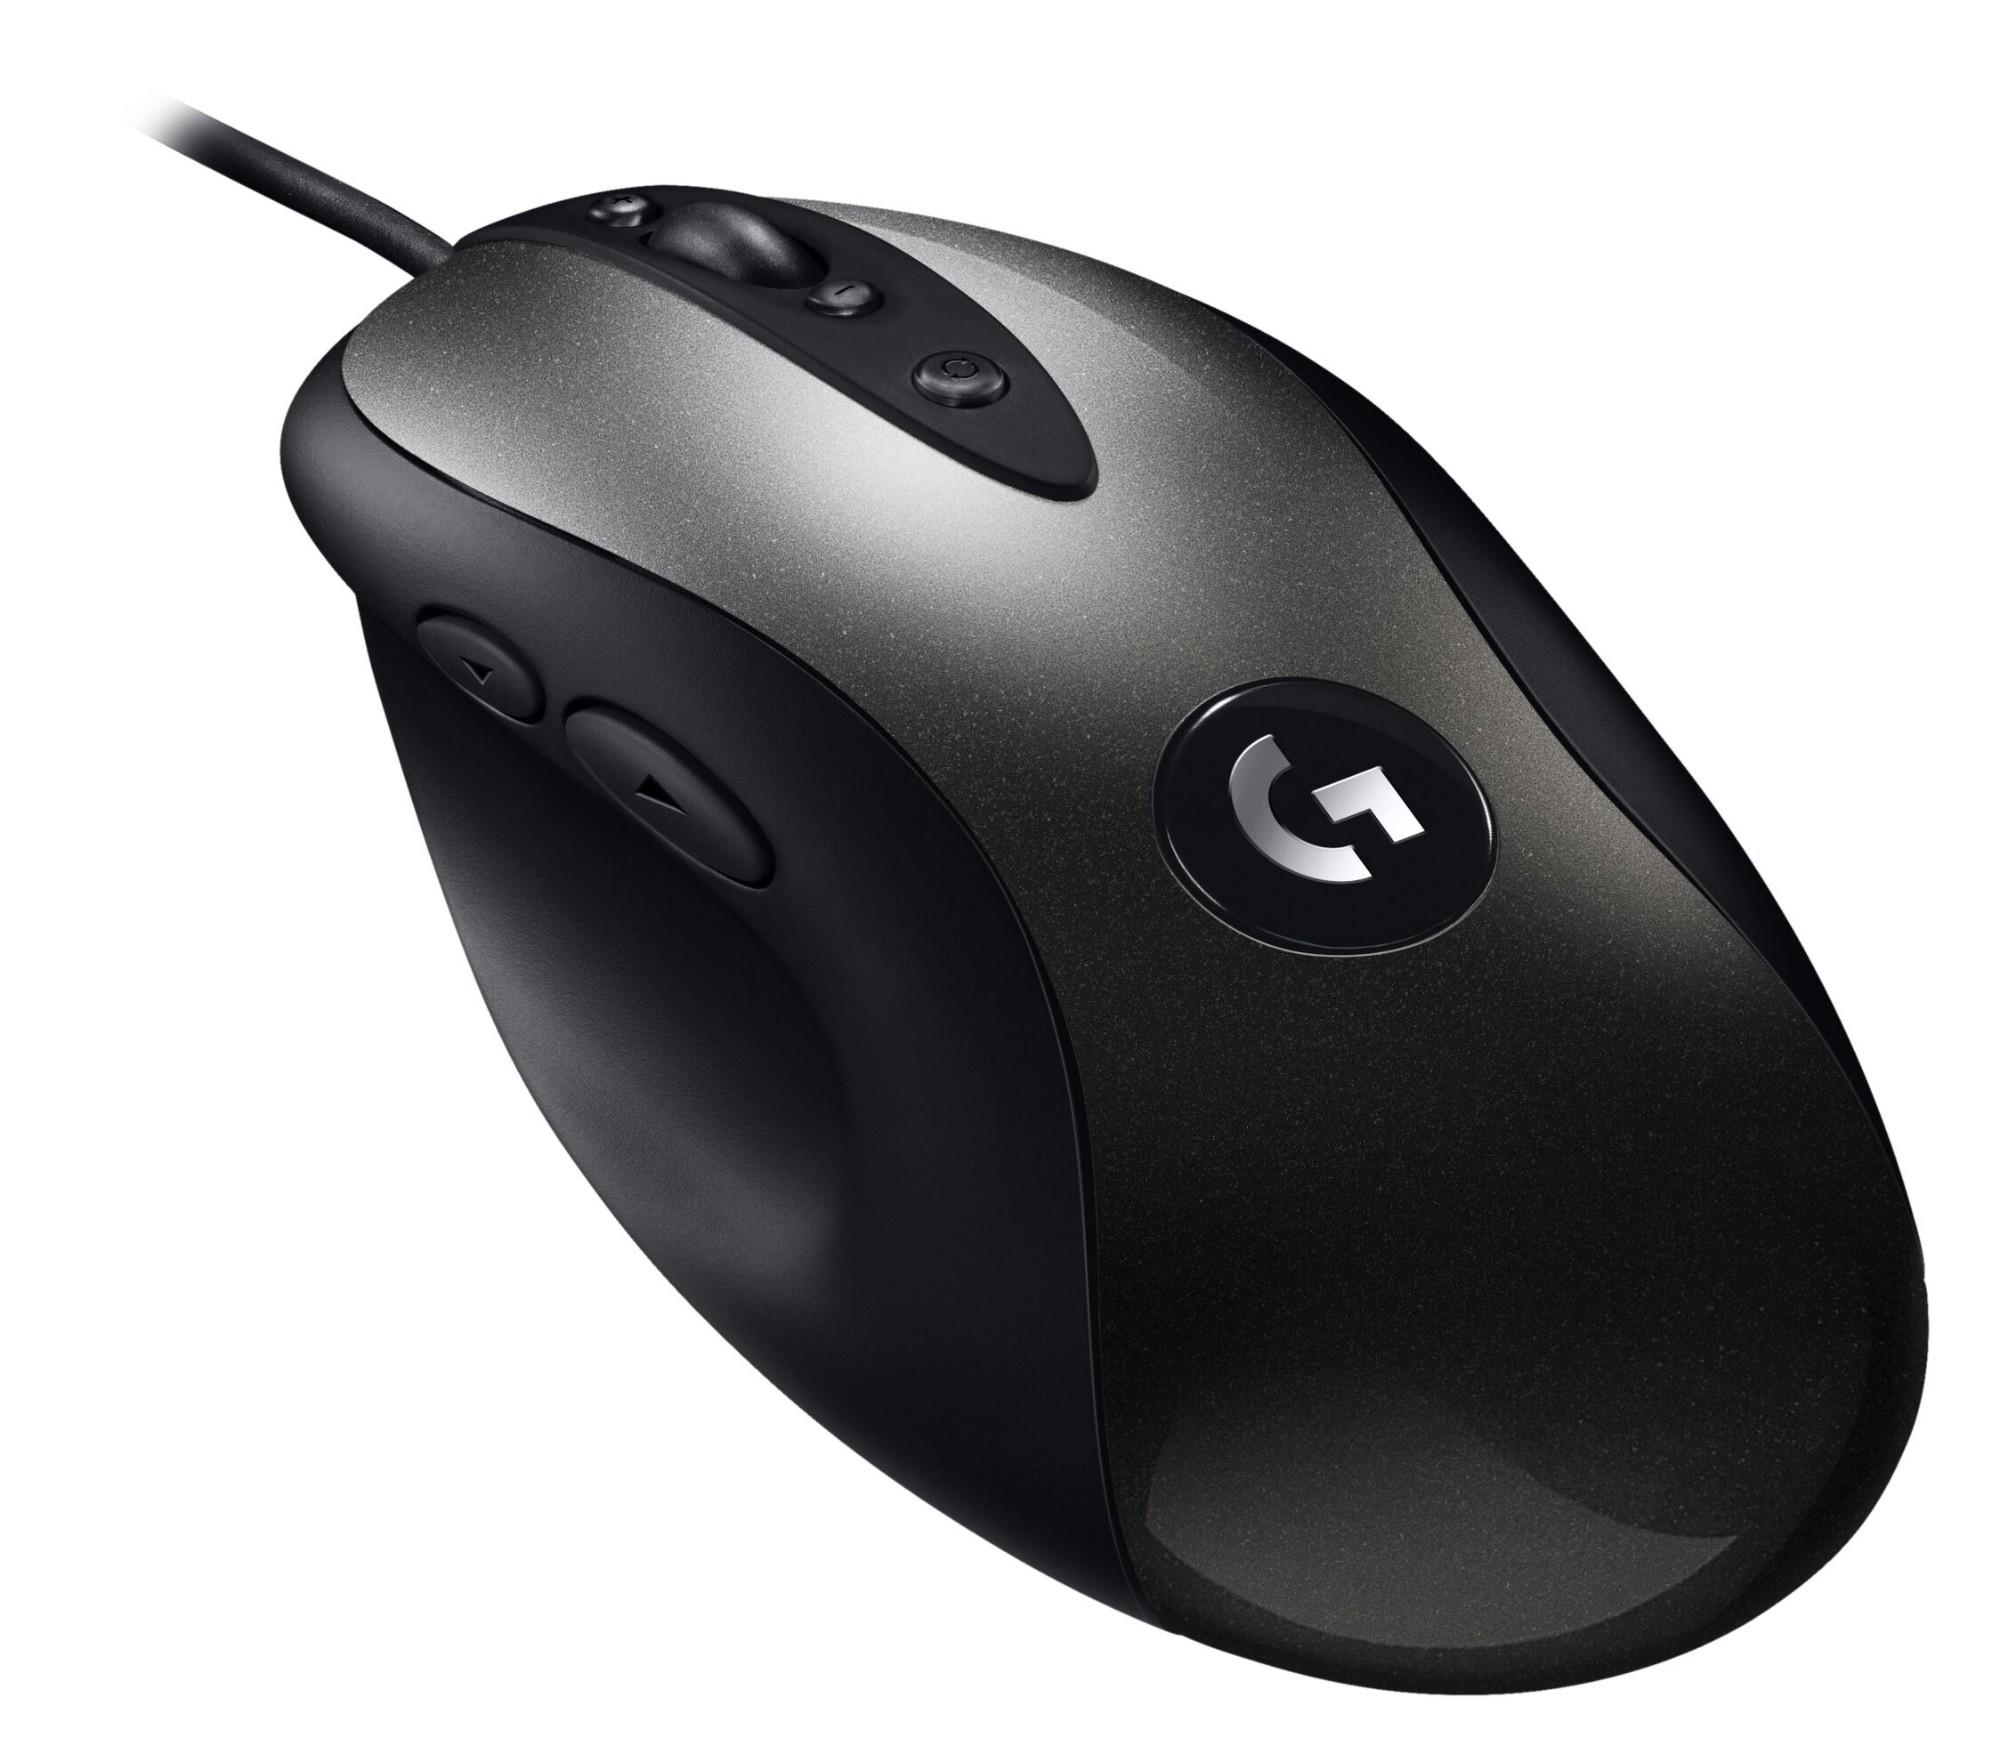 Logitech MX518 ratón USB tipo A 16000 DPI mano derecha